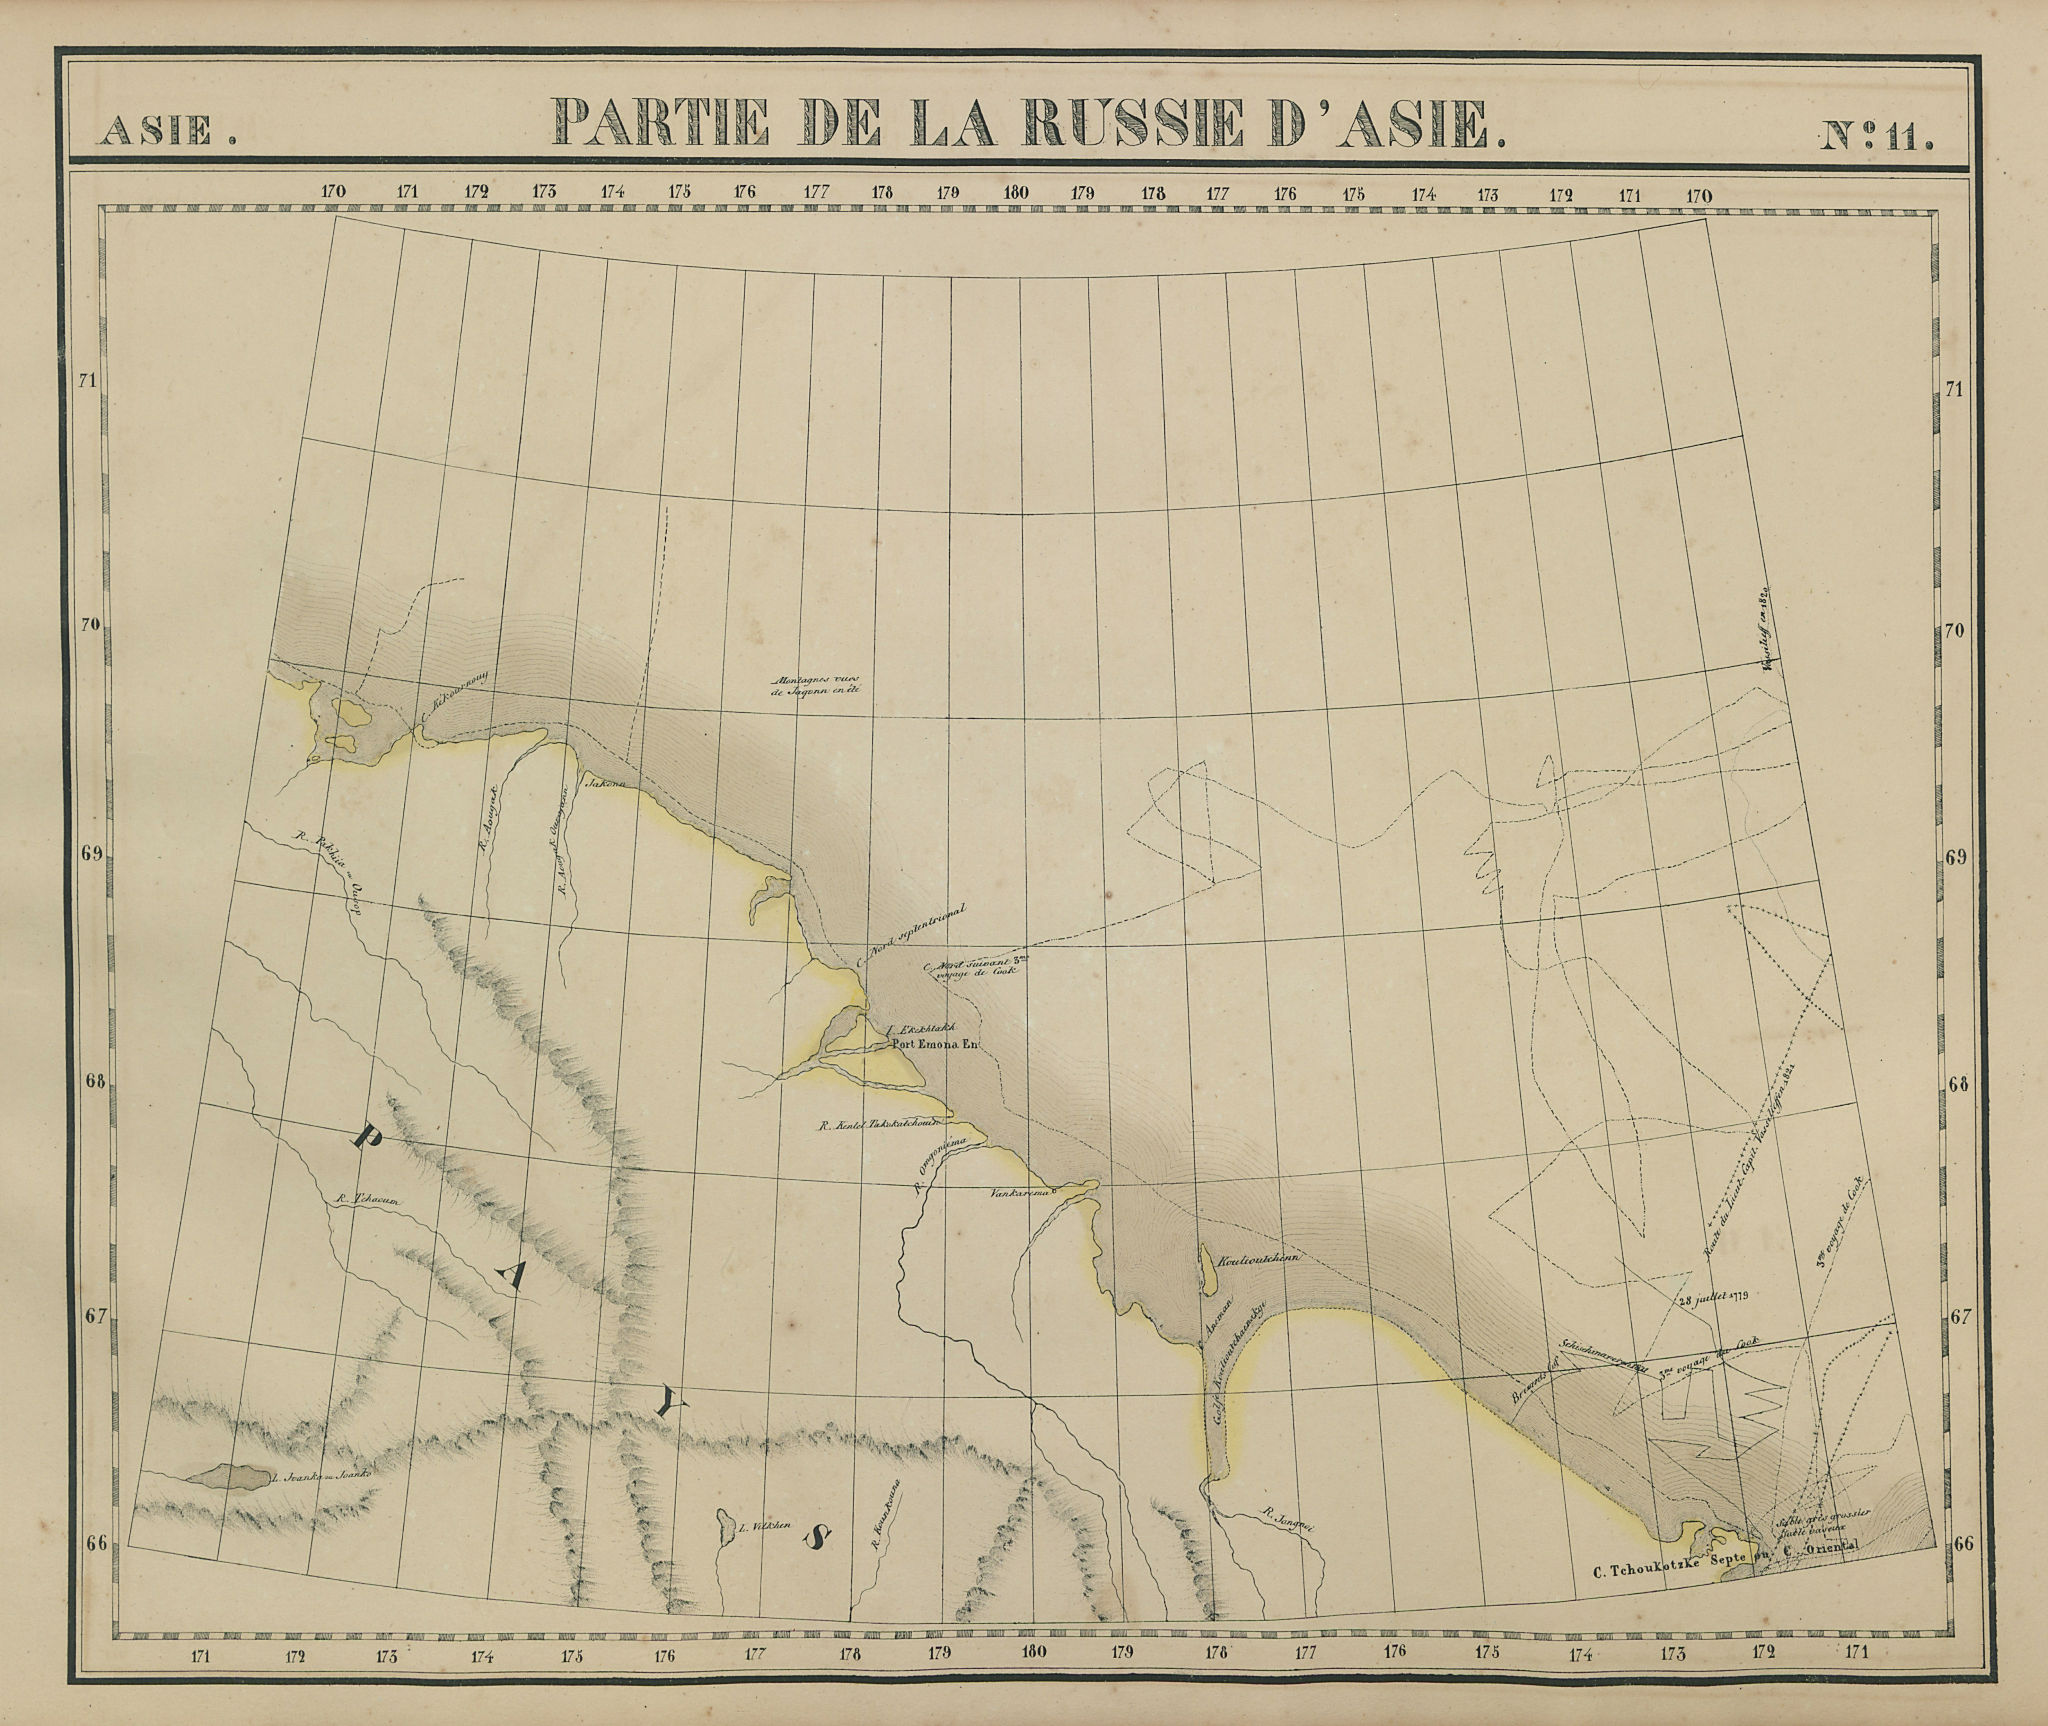 Russie d'Asie #11 Russia. Chukchi Peninsula & sea. VANDERMAELEN 1827 old map